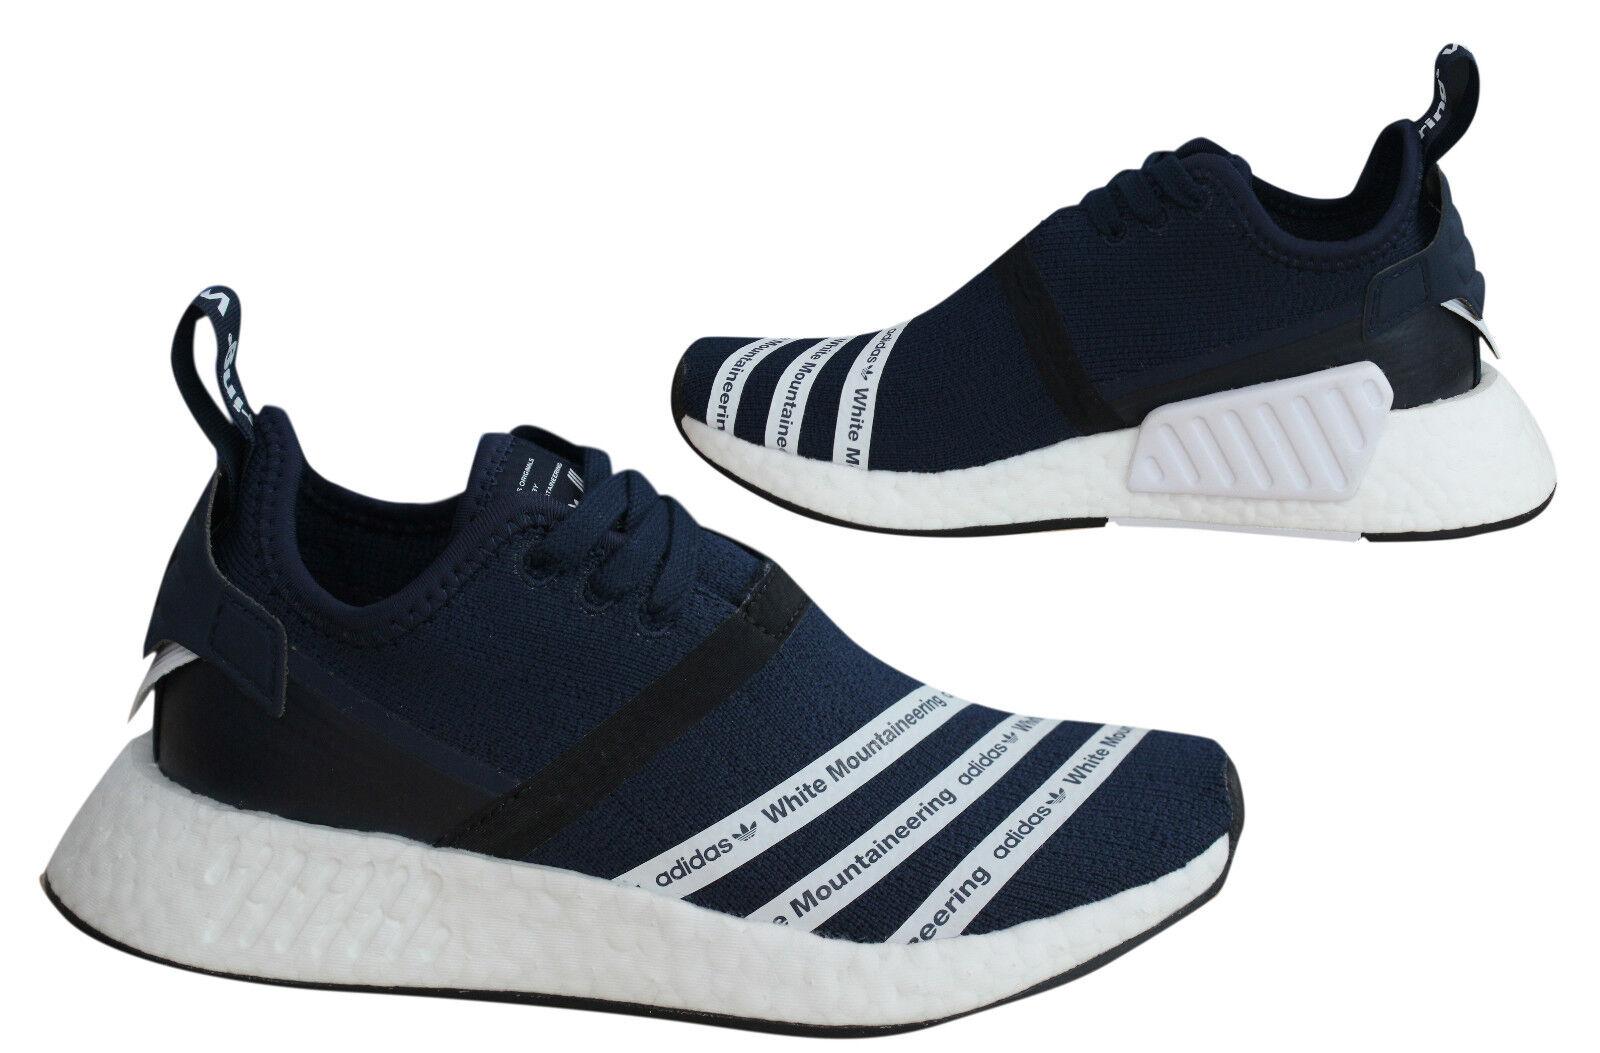 Adidas Originals White Mountaineering NMD R2 Primeknit Mens Trainers BB3072 M17